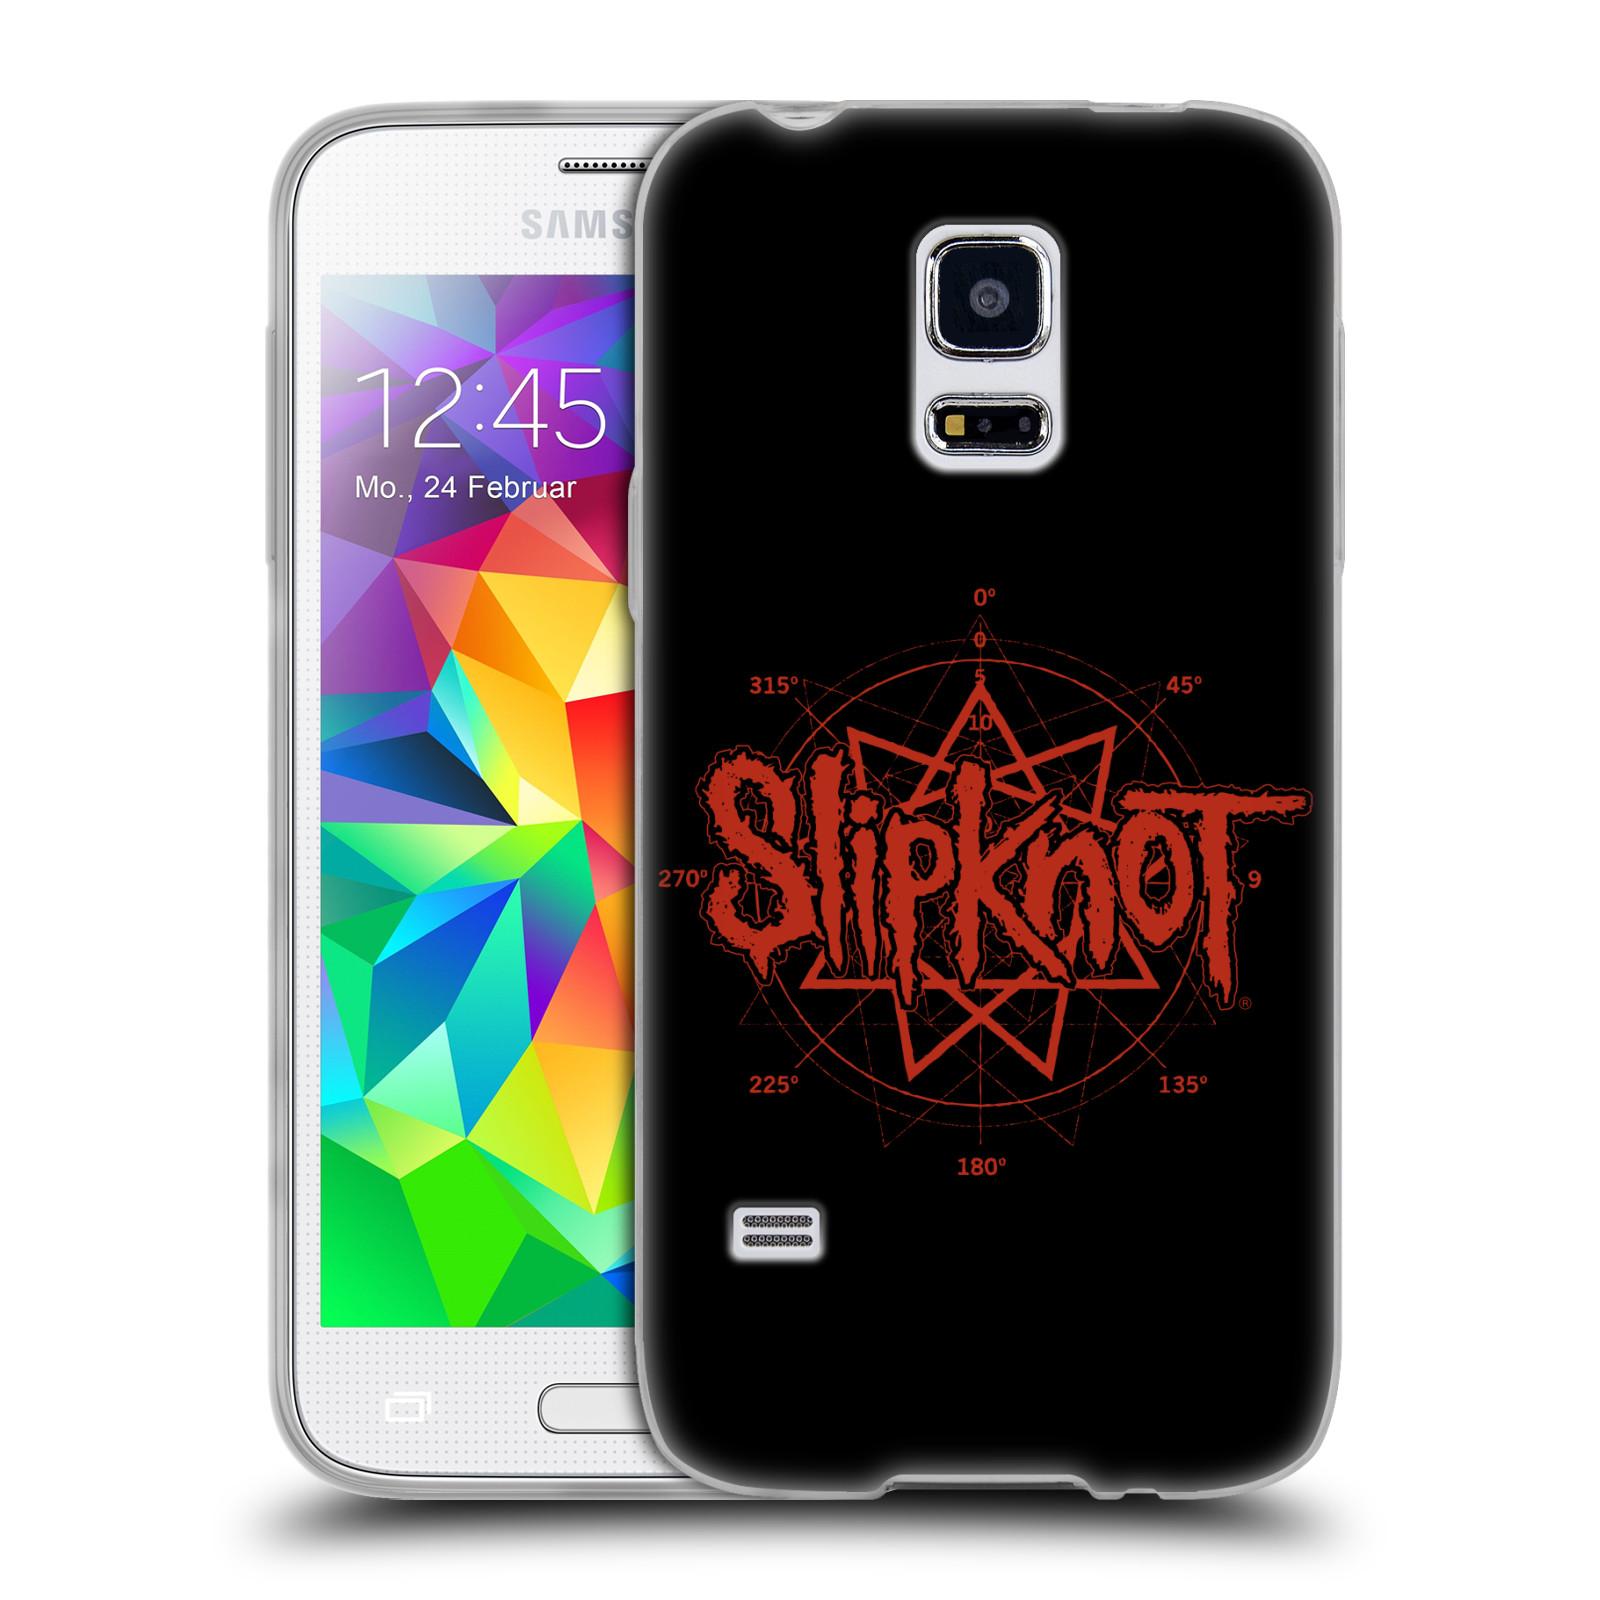 HEAD CASE silikonový obal na mobil Samsung Galaxy S5 MINI hudební skupina Slipknot logo